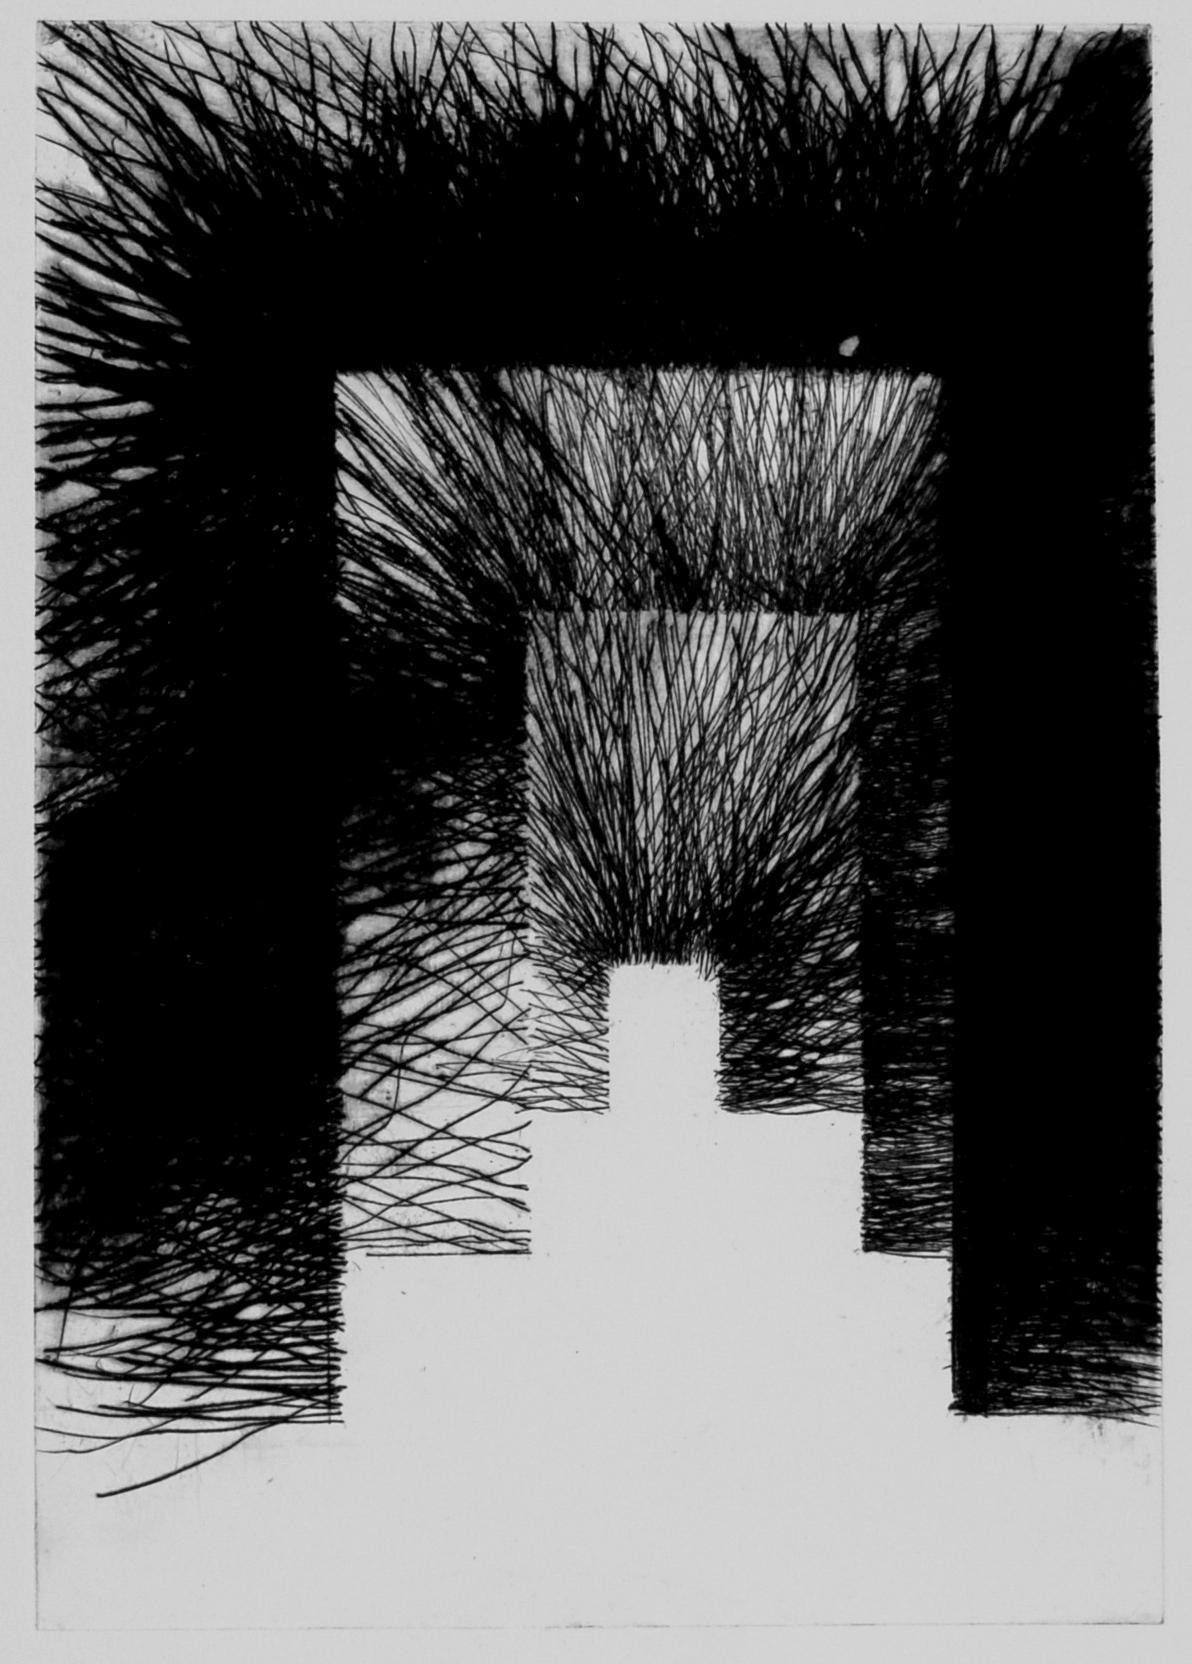 12.04_PORTES_EXPOSITION_IMAGES_GRAVURES_09